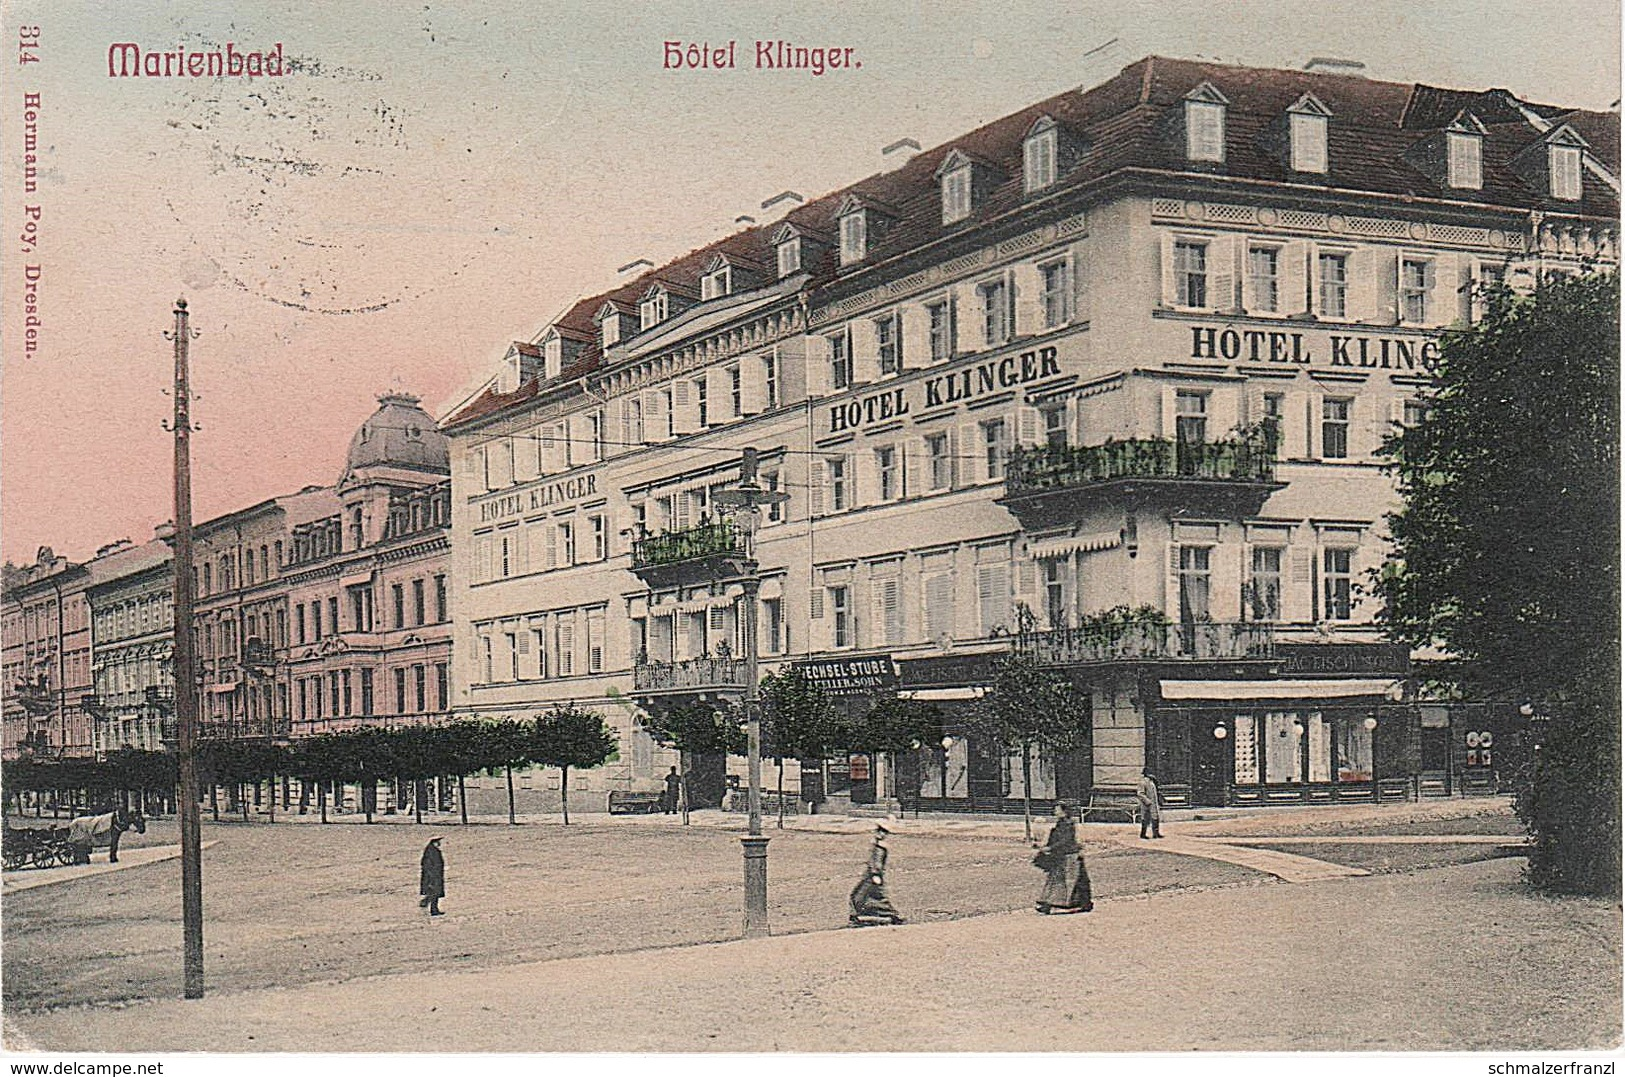 AK Marianske Lazne Marienbad Hotel Klinger Marienstraße Glatzen Kladska Stanowitz Stanoviste Auschowitz Usovice Kuttnau - Sudeten